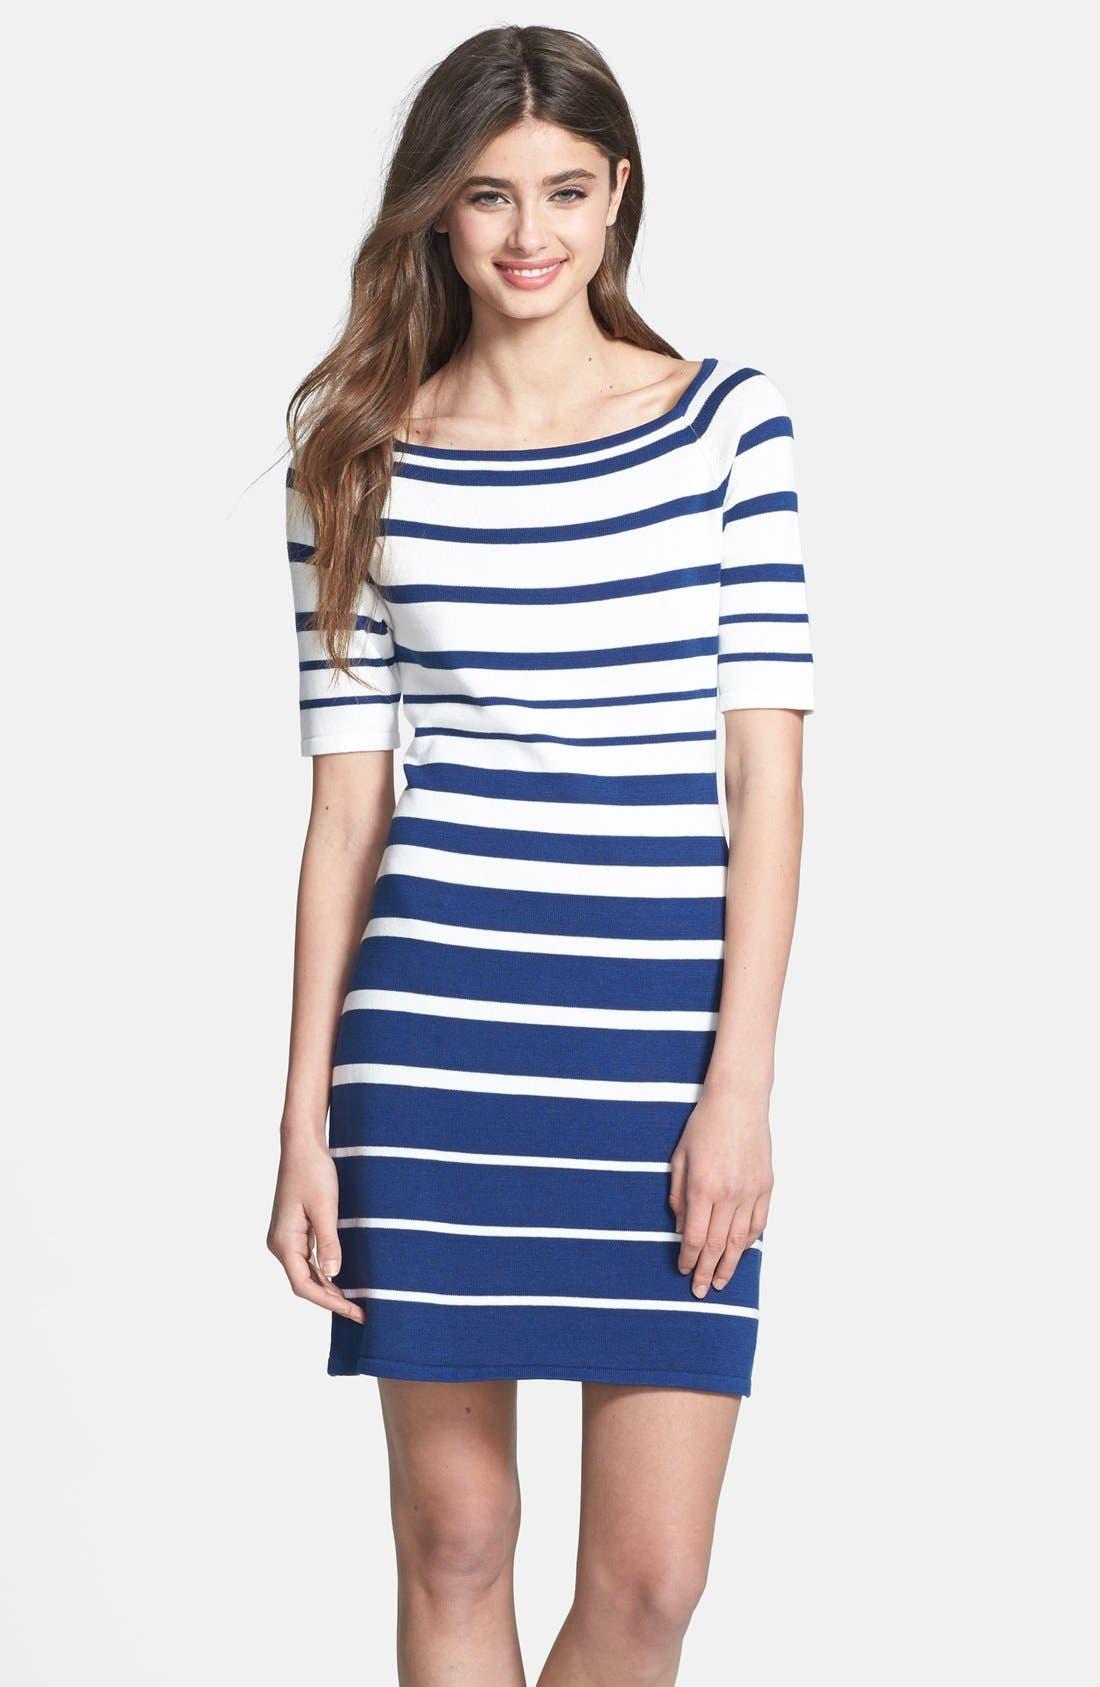 Alternate Image 1 Selected - Trina Trina Turk 'Olive' Stripe Sweater Dress